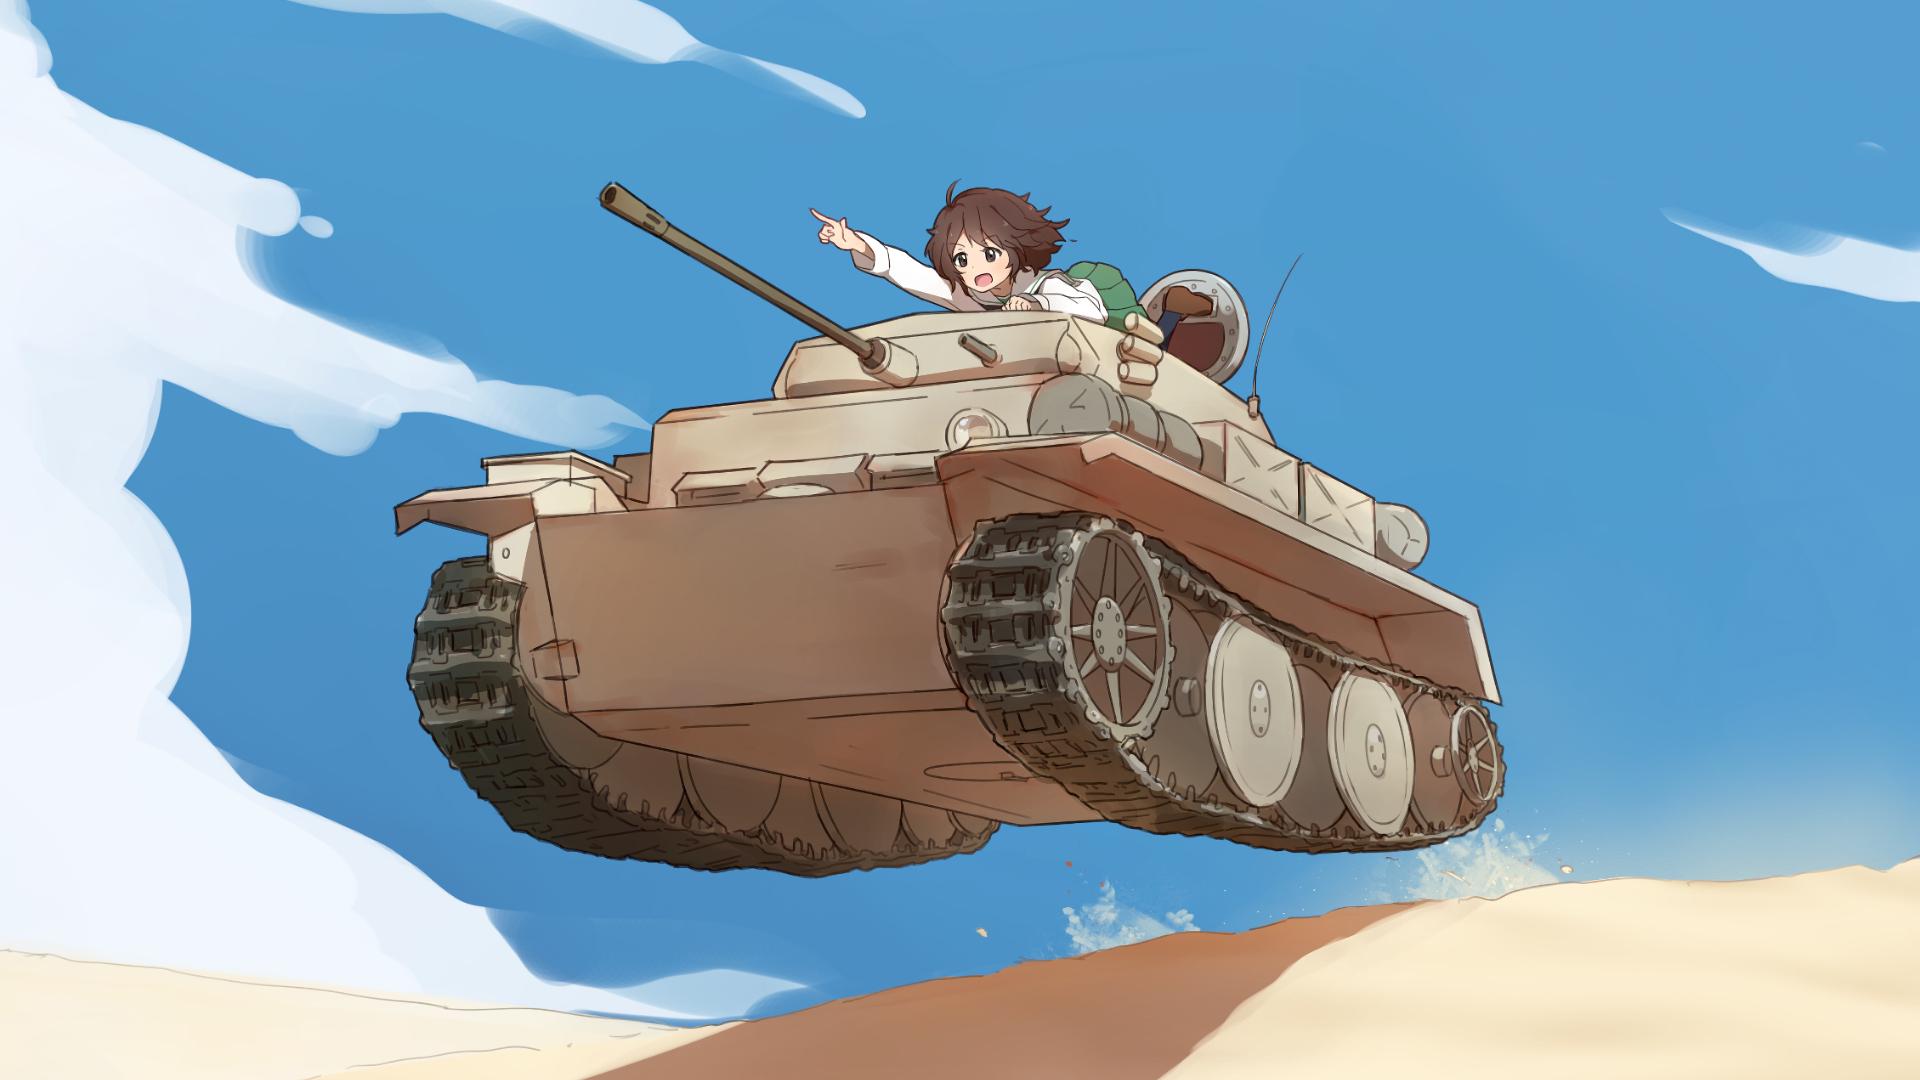 Аниме картинки с танкистами